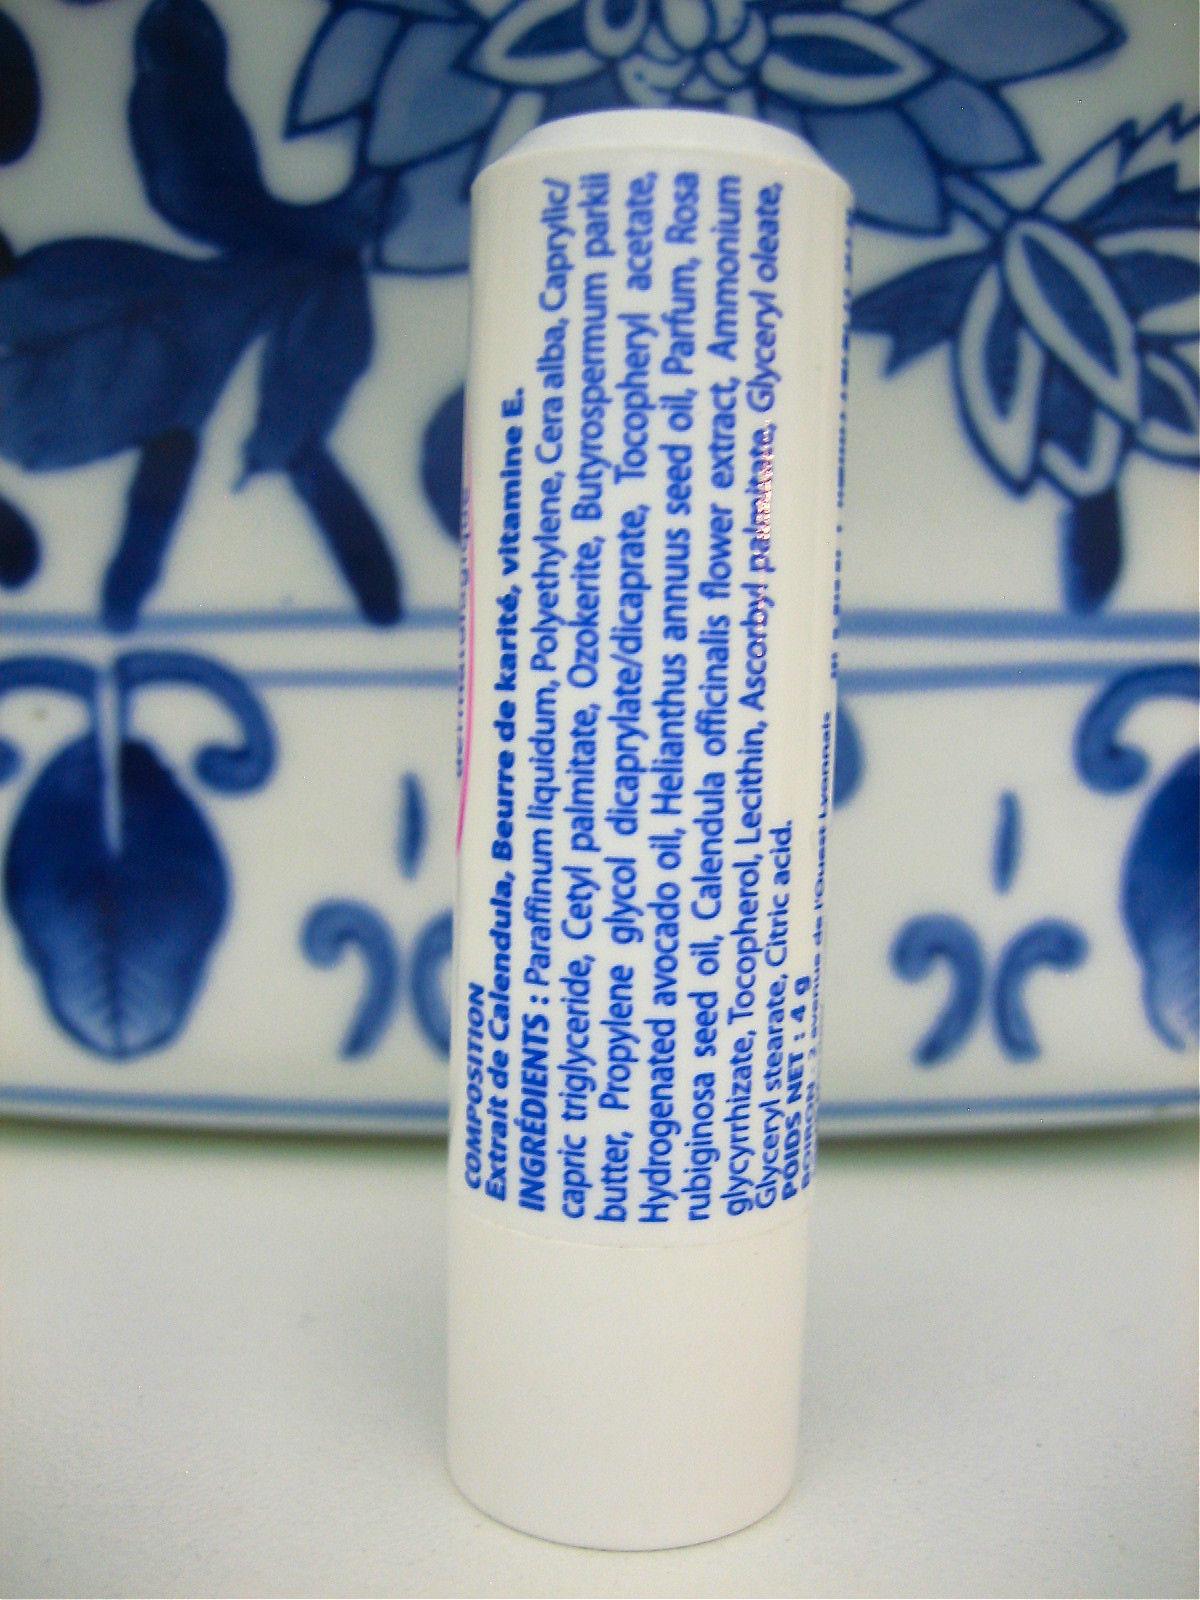 2 Boiron Homeostick Lip Stick Balm